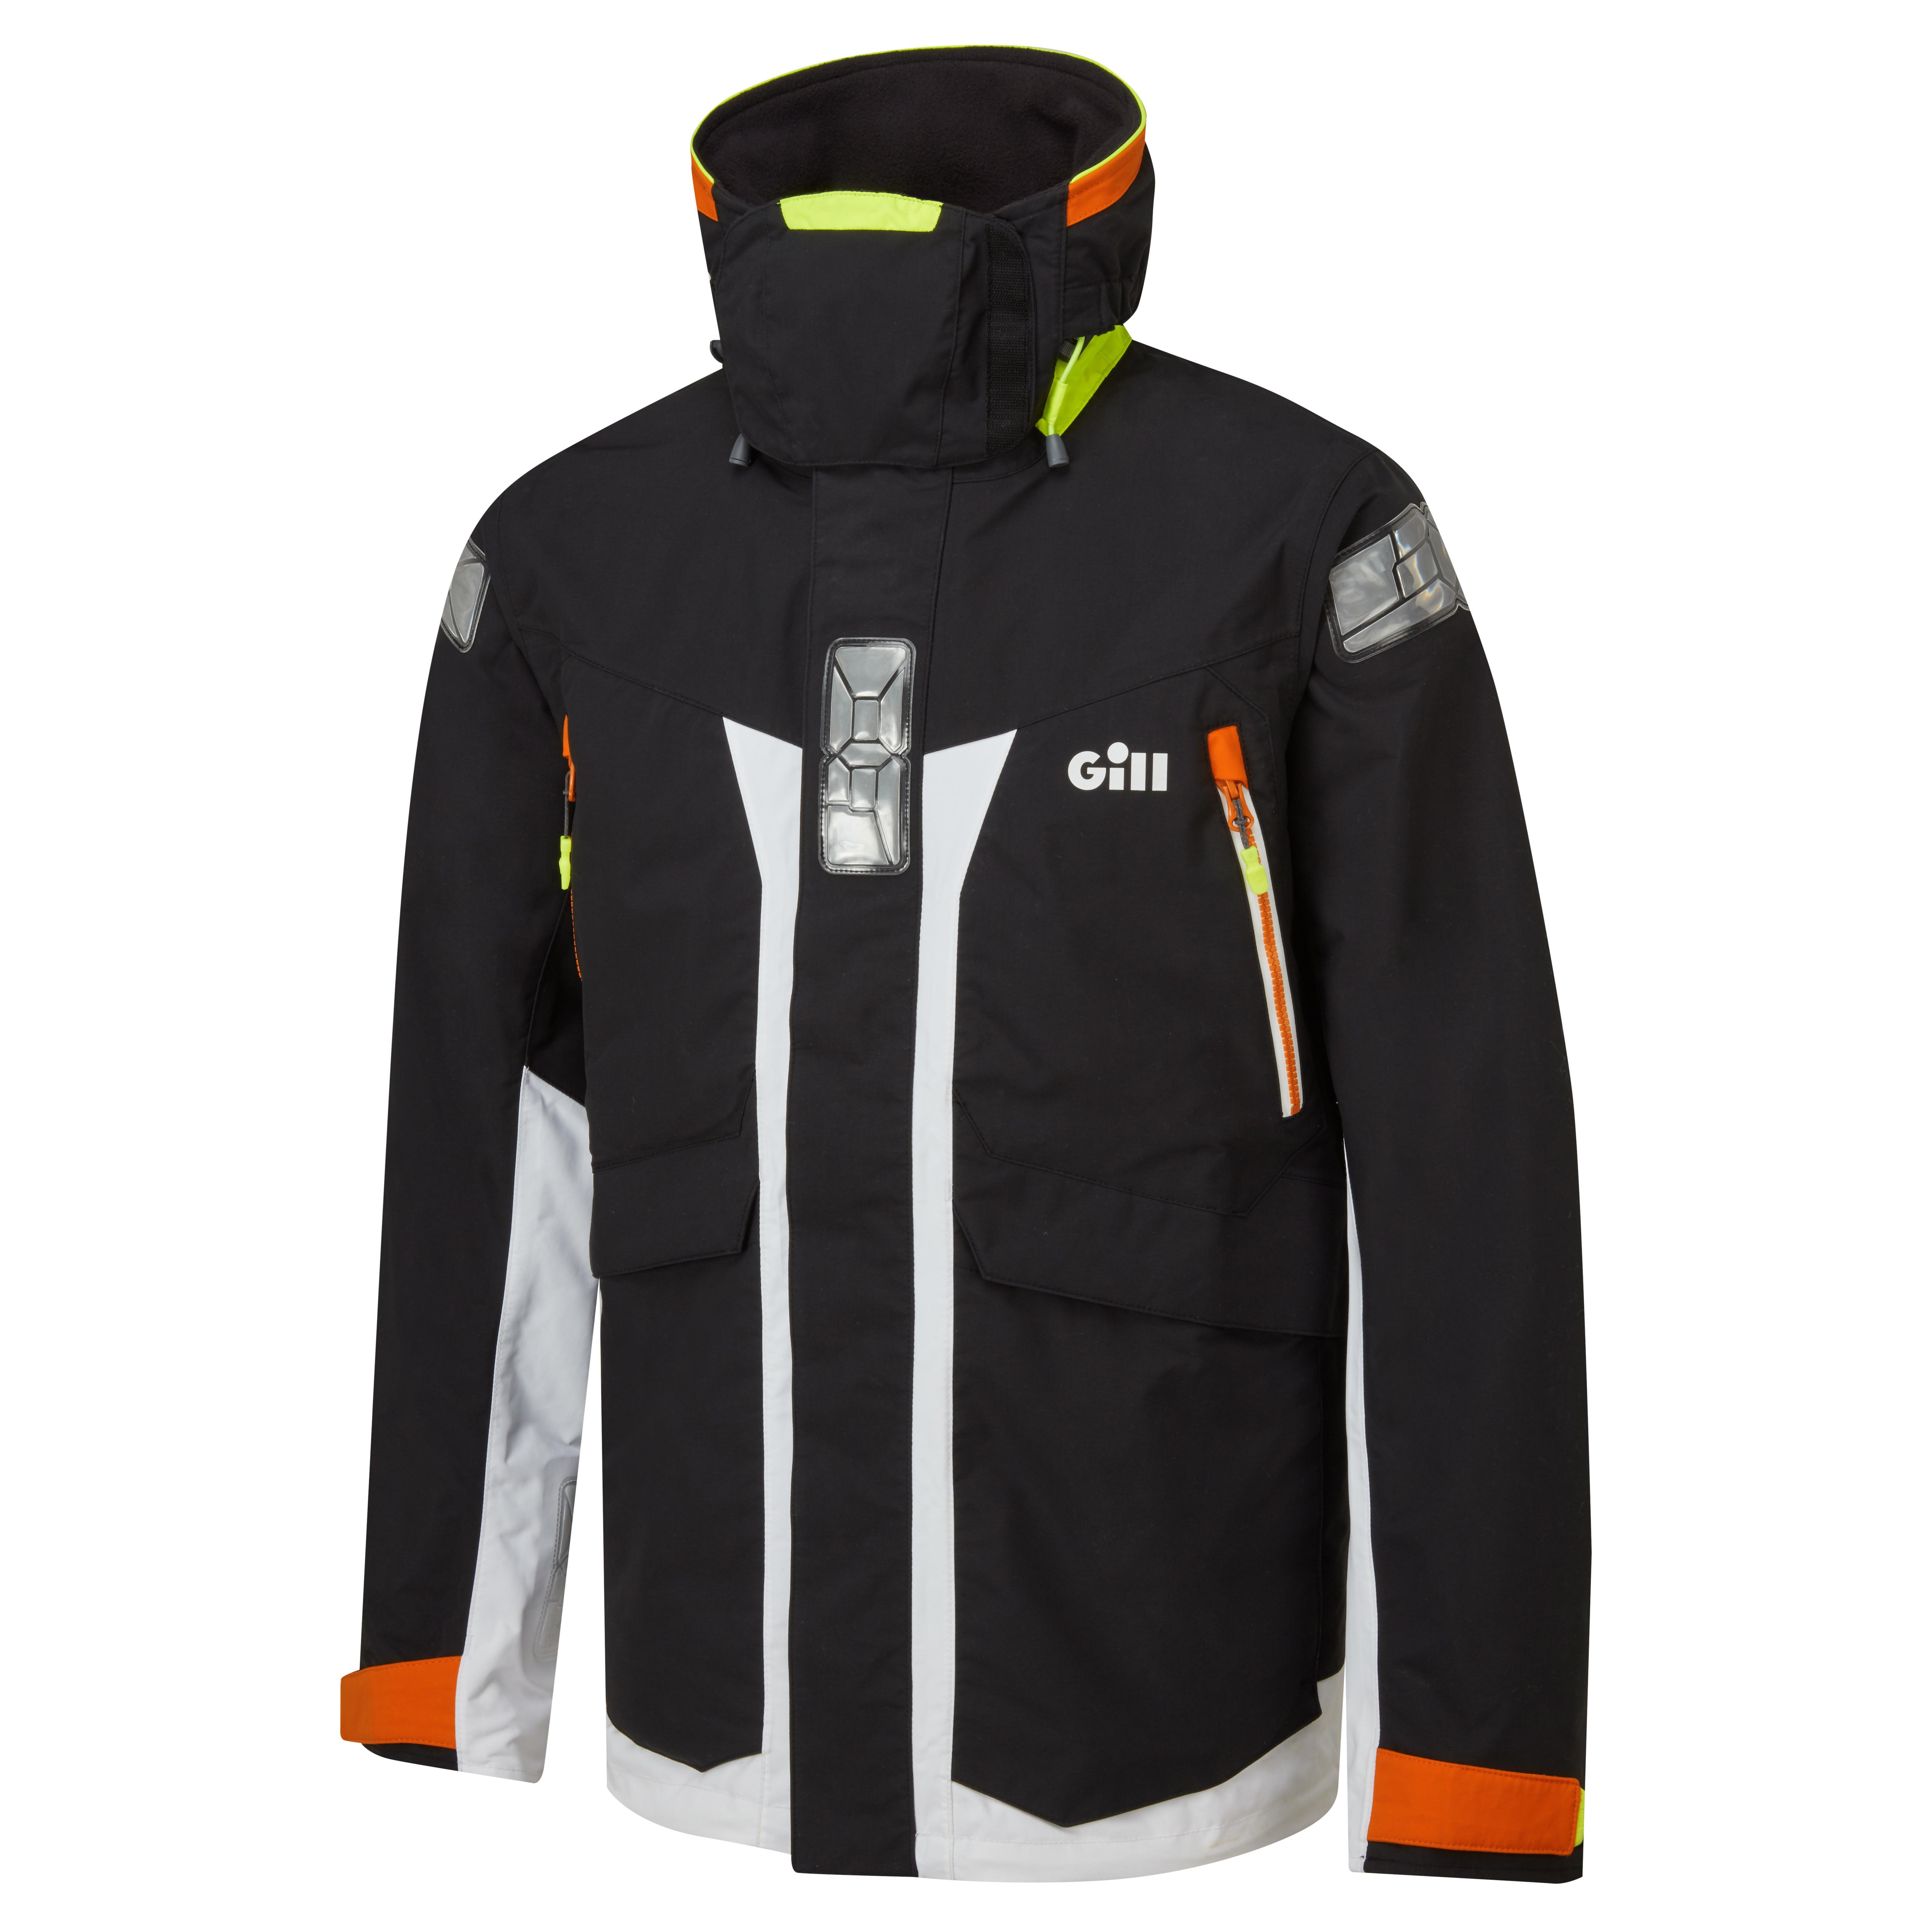 OS2 Offshore Men's Jacket - OS24J-BLKLTD_3.jpg